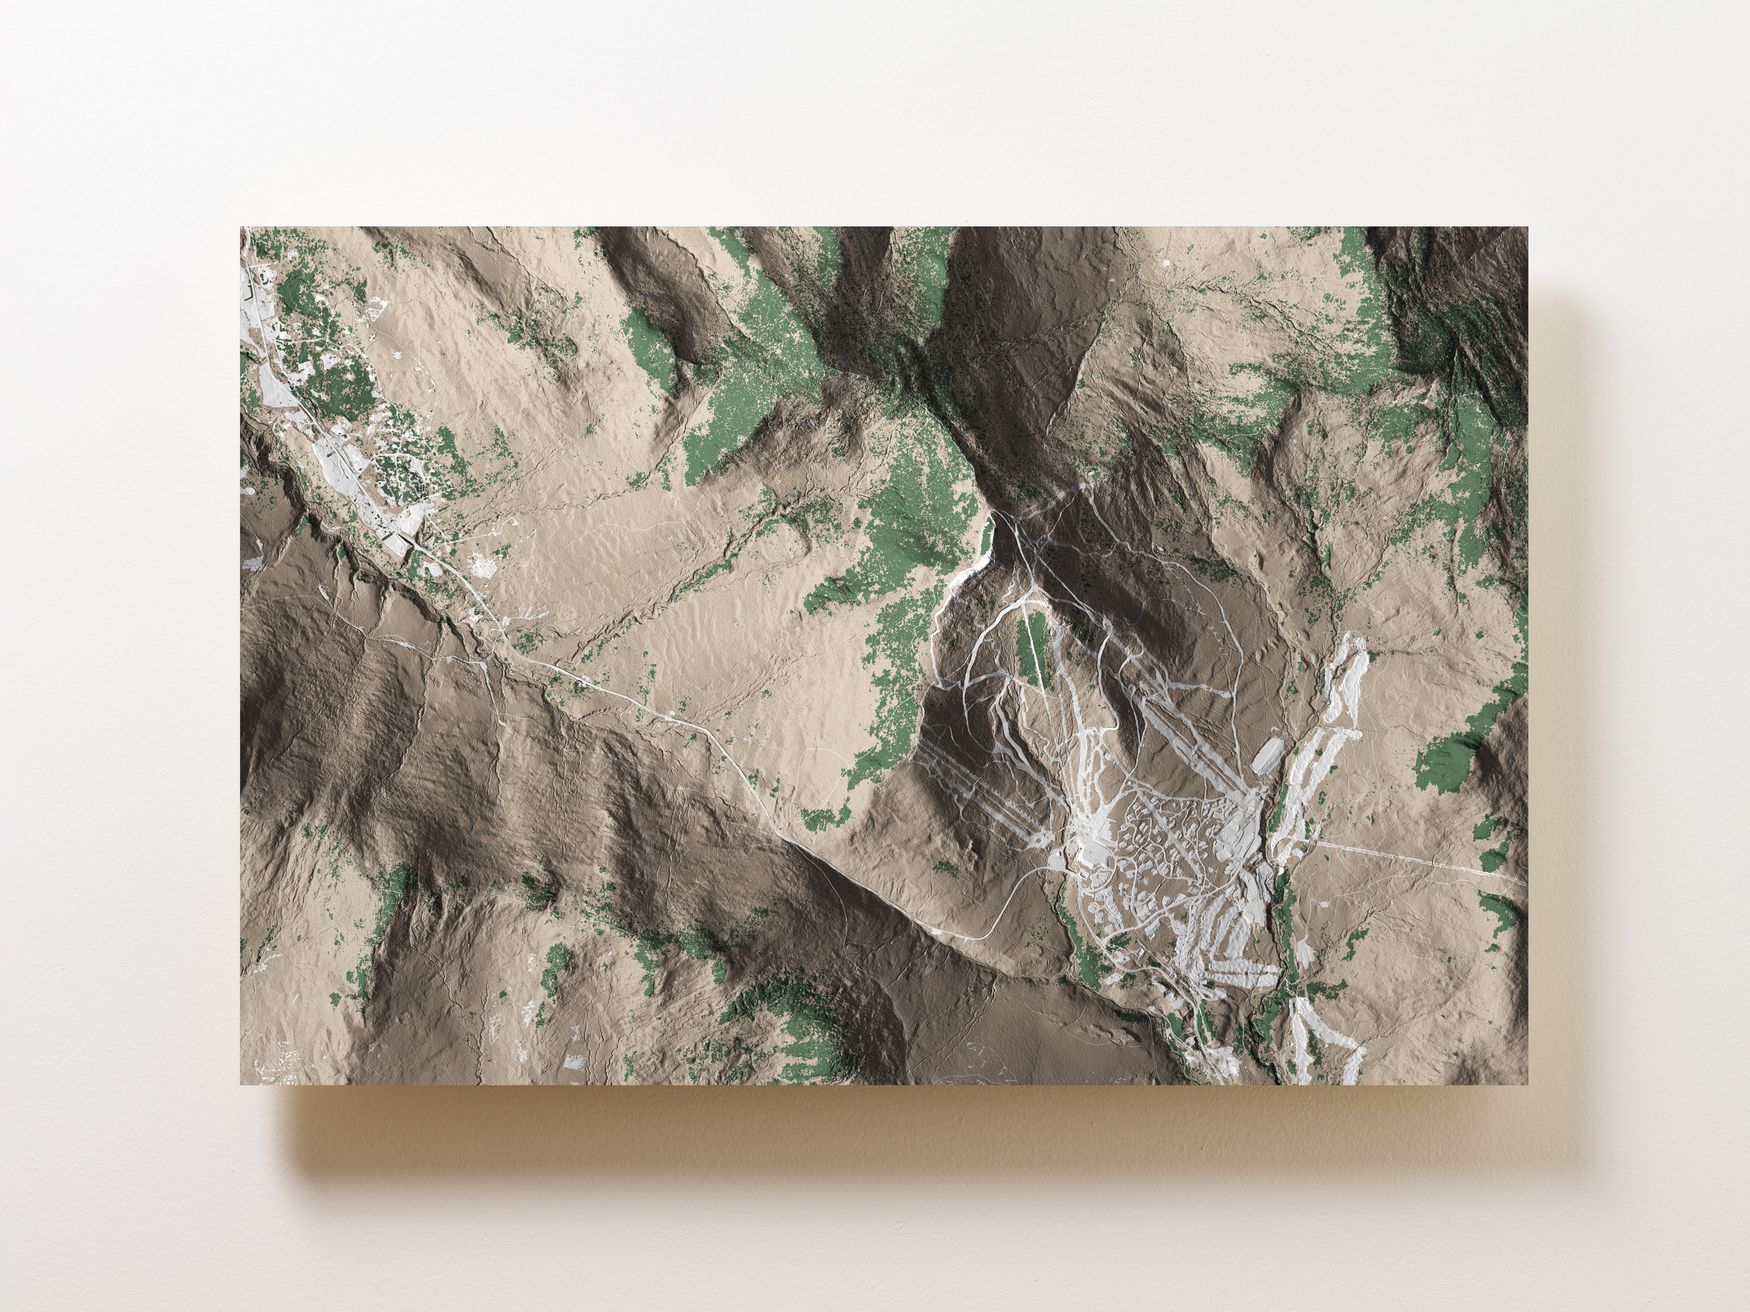 Jay Peak Wall Map